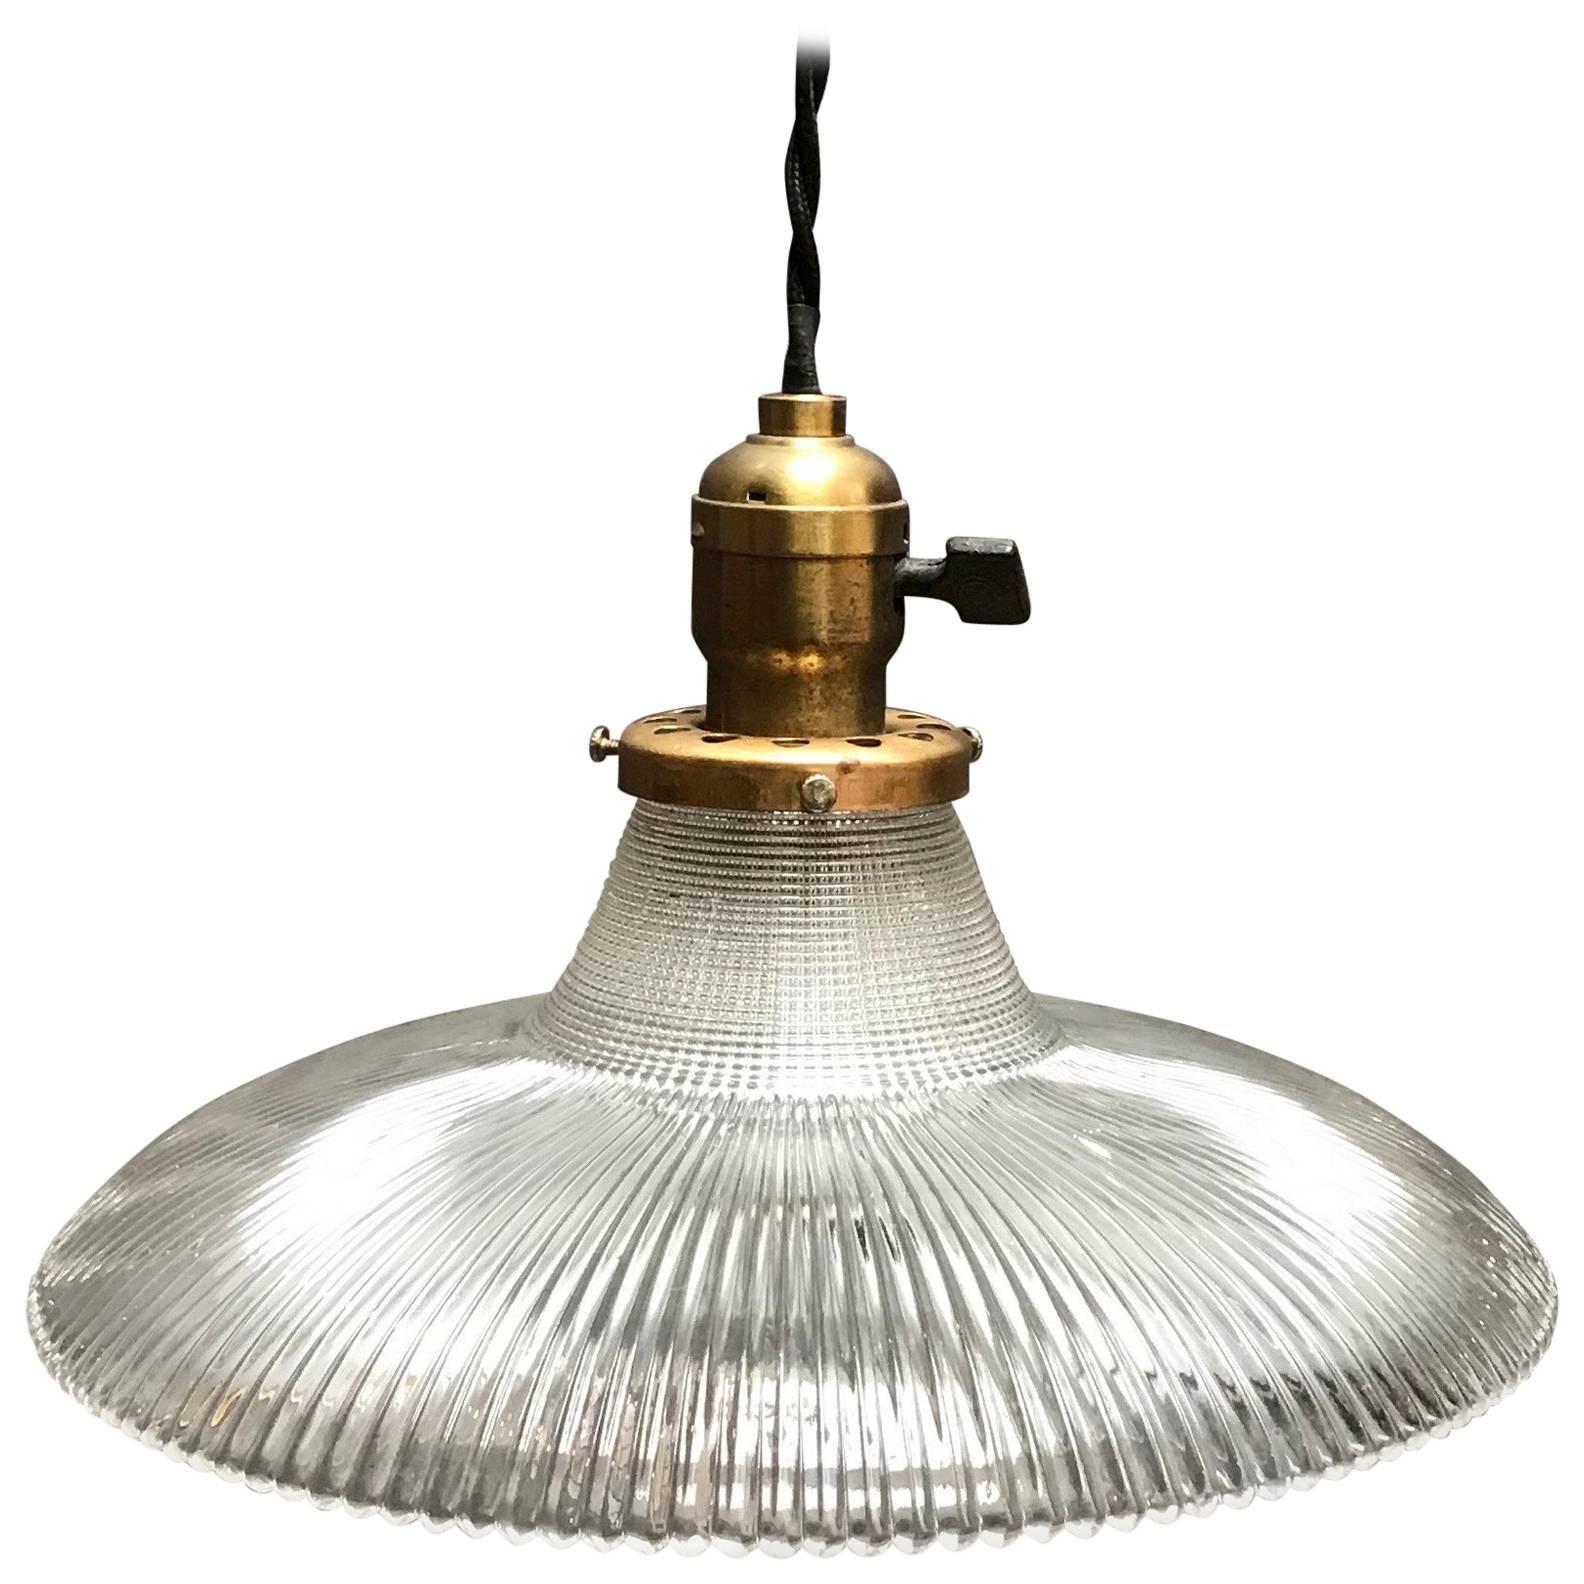 Industrial Fluted Prismatic Holophane Glass Pendant Light  sc 1 st  1stDibs & 1920s Acorn Prismatic Pendants by Holophane For Sale at 1stdibs azcodes.com